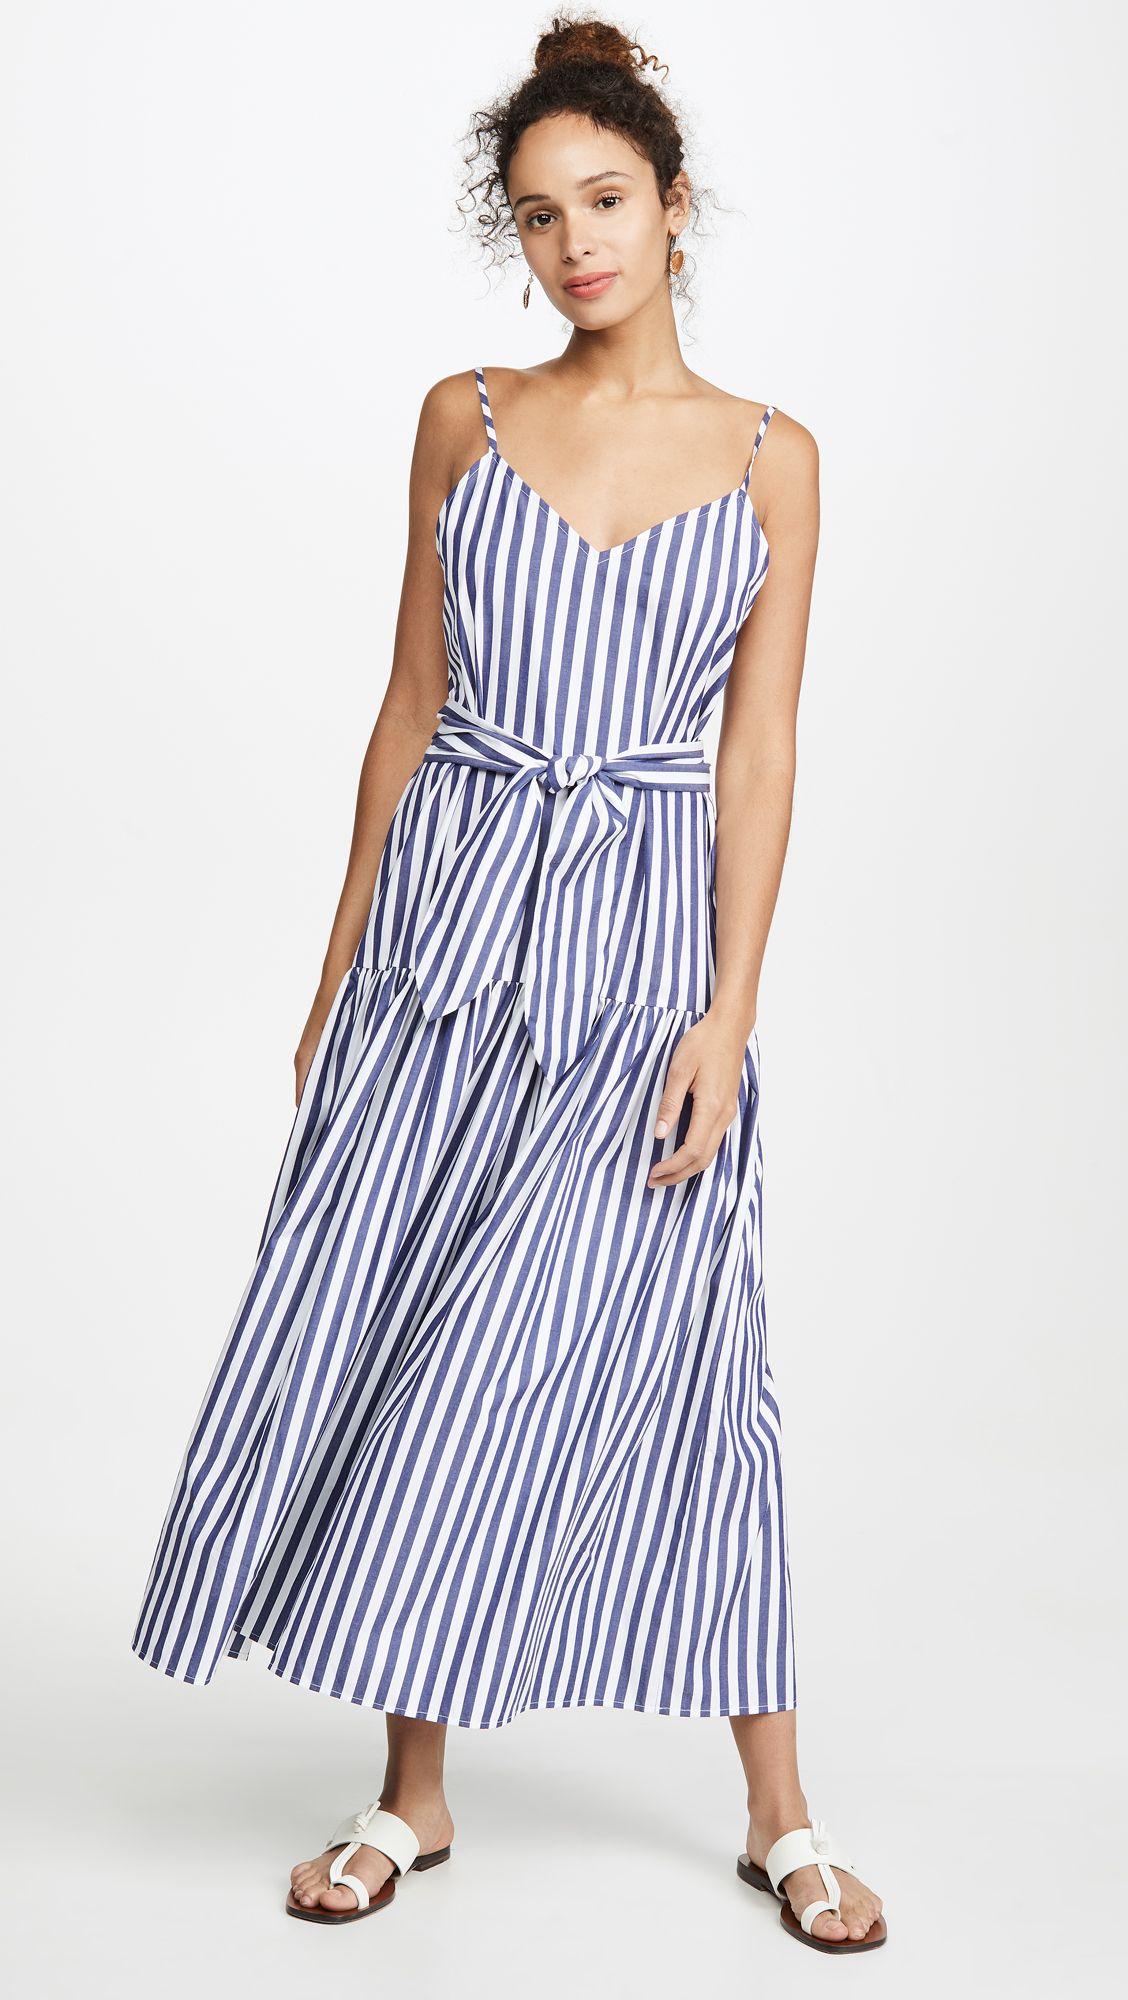 Blue Stripe Maxi Dress Dresses Fashion Clothes Women Blue Striped Maxi Dress [ 2000 x 1128 Pixel ]